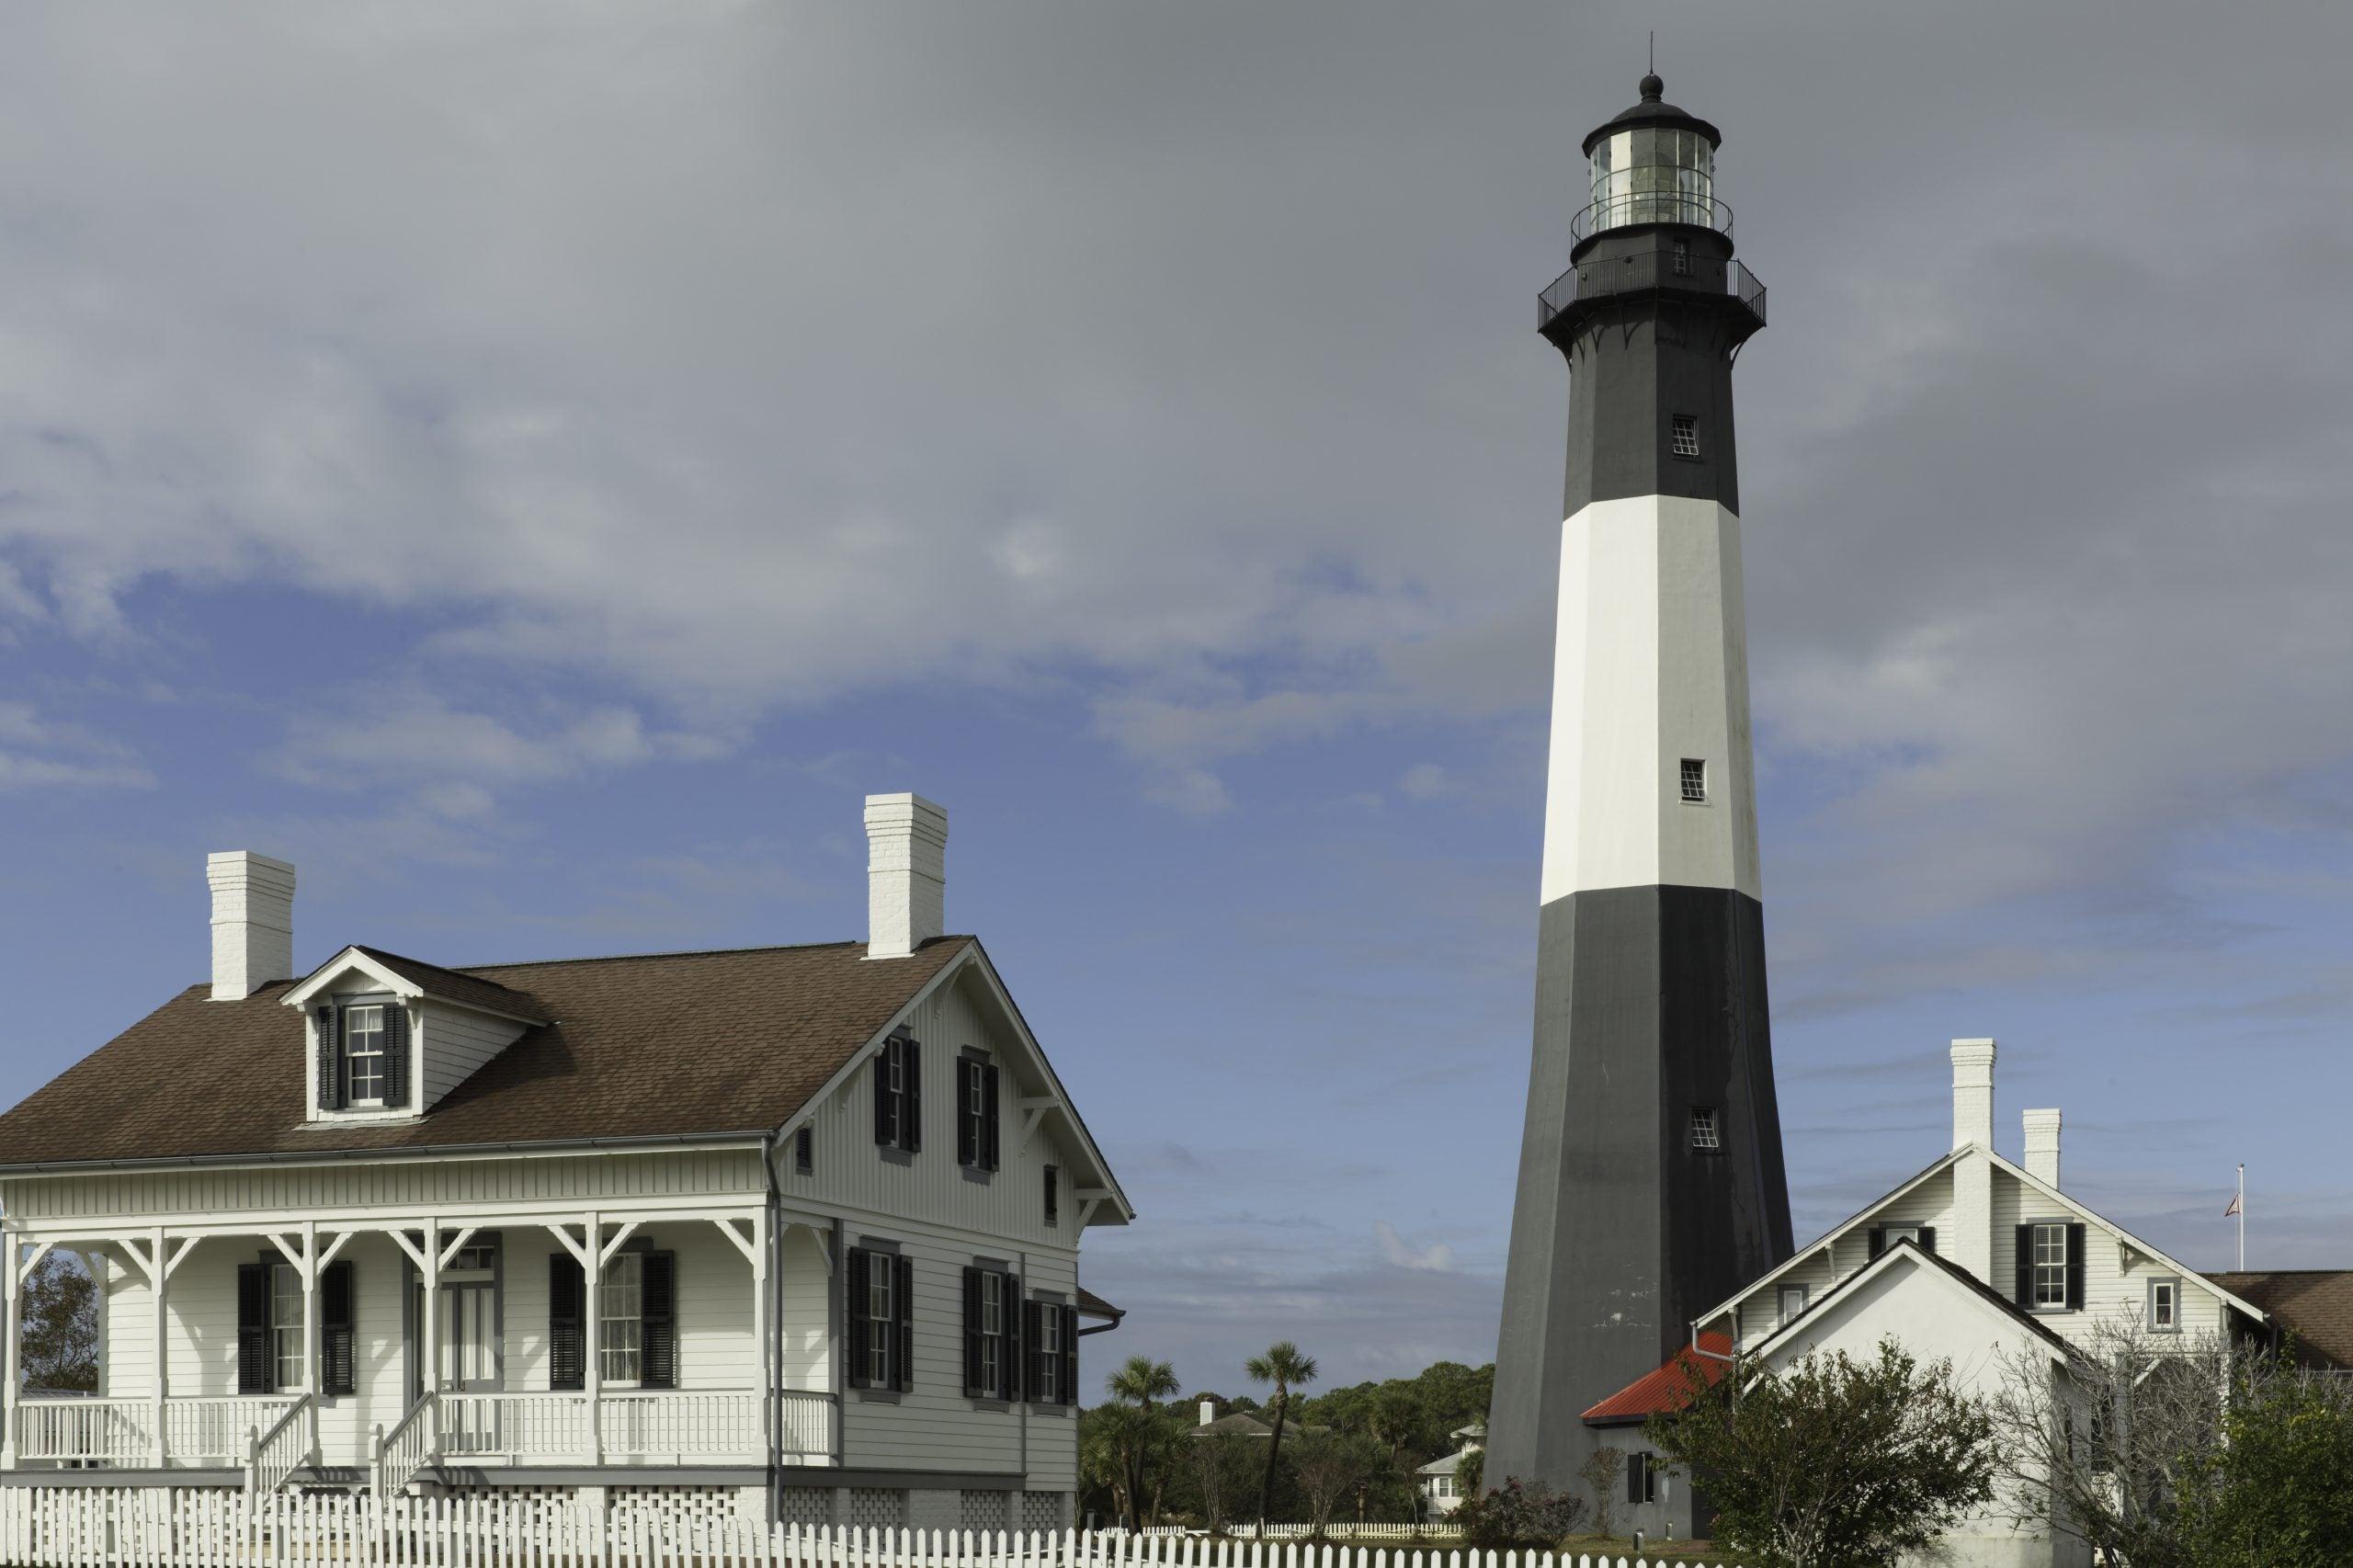 The Tybee Island Lighthouse in Savannah Georgia.